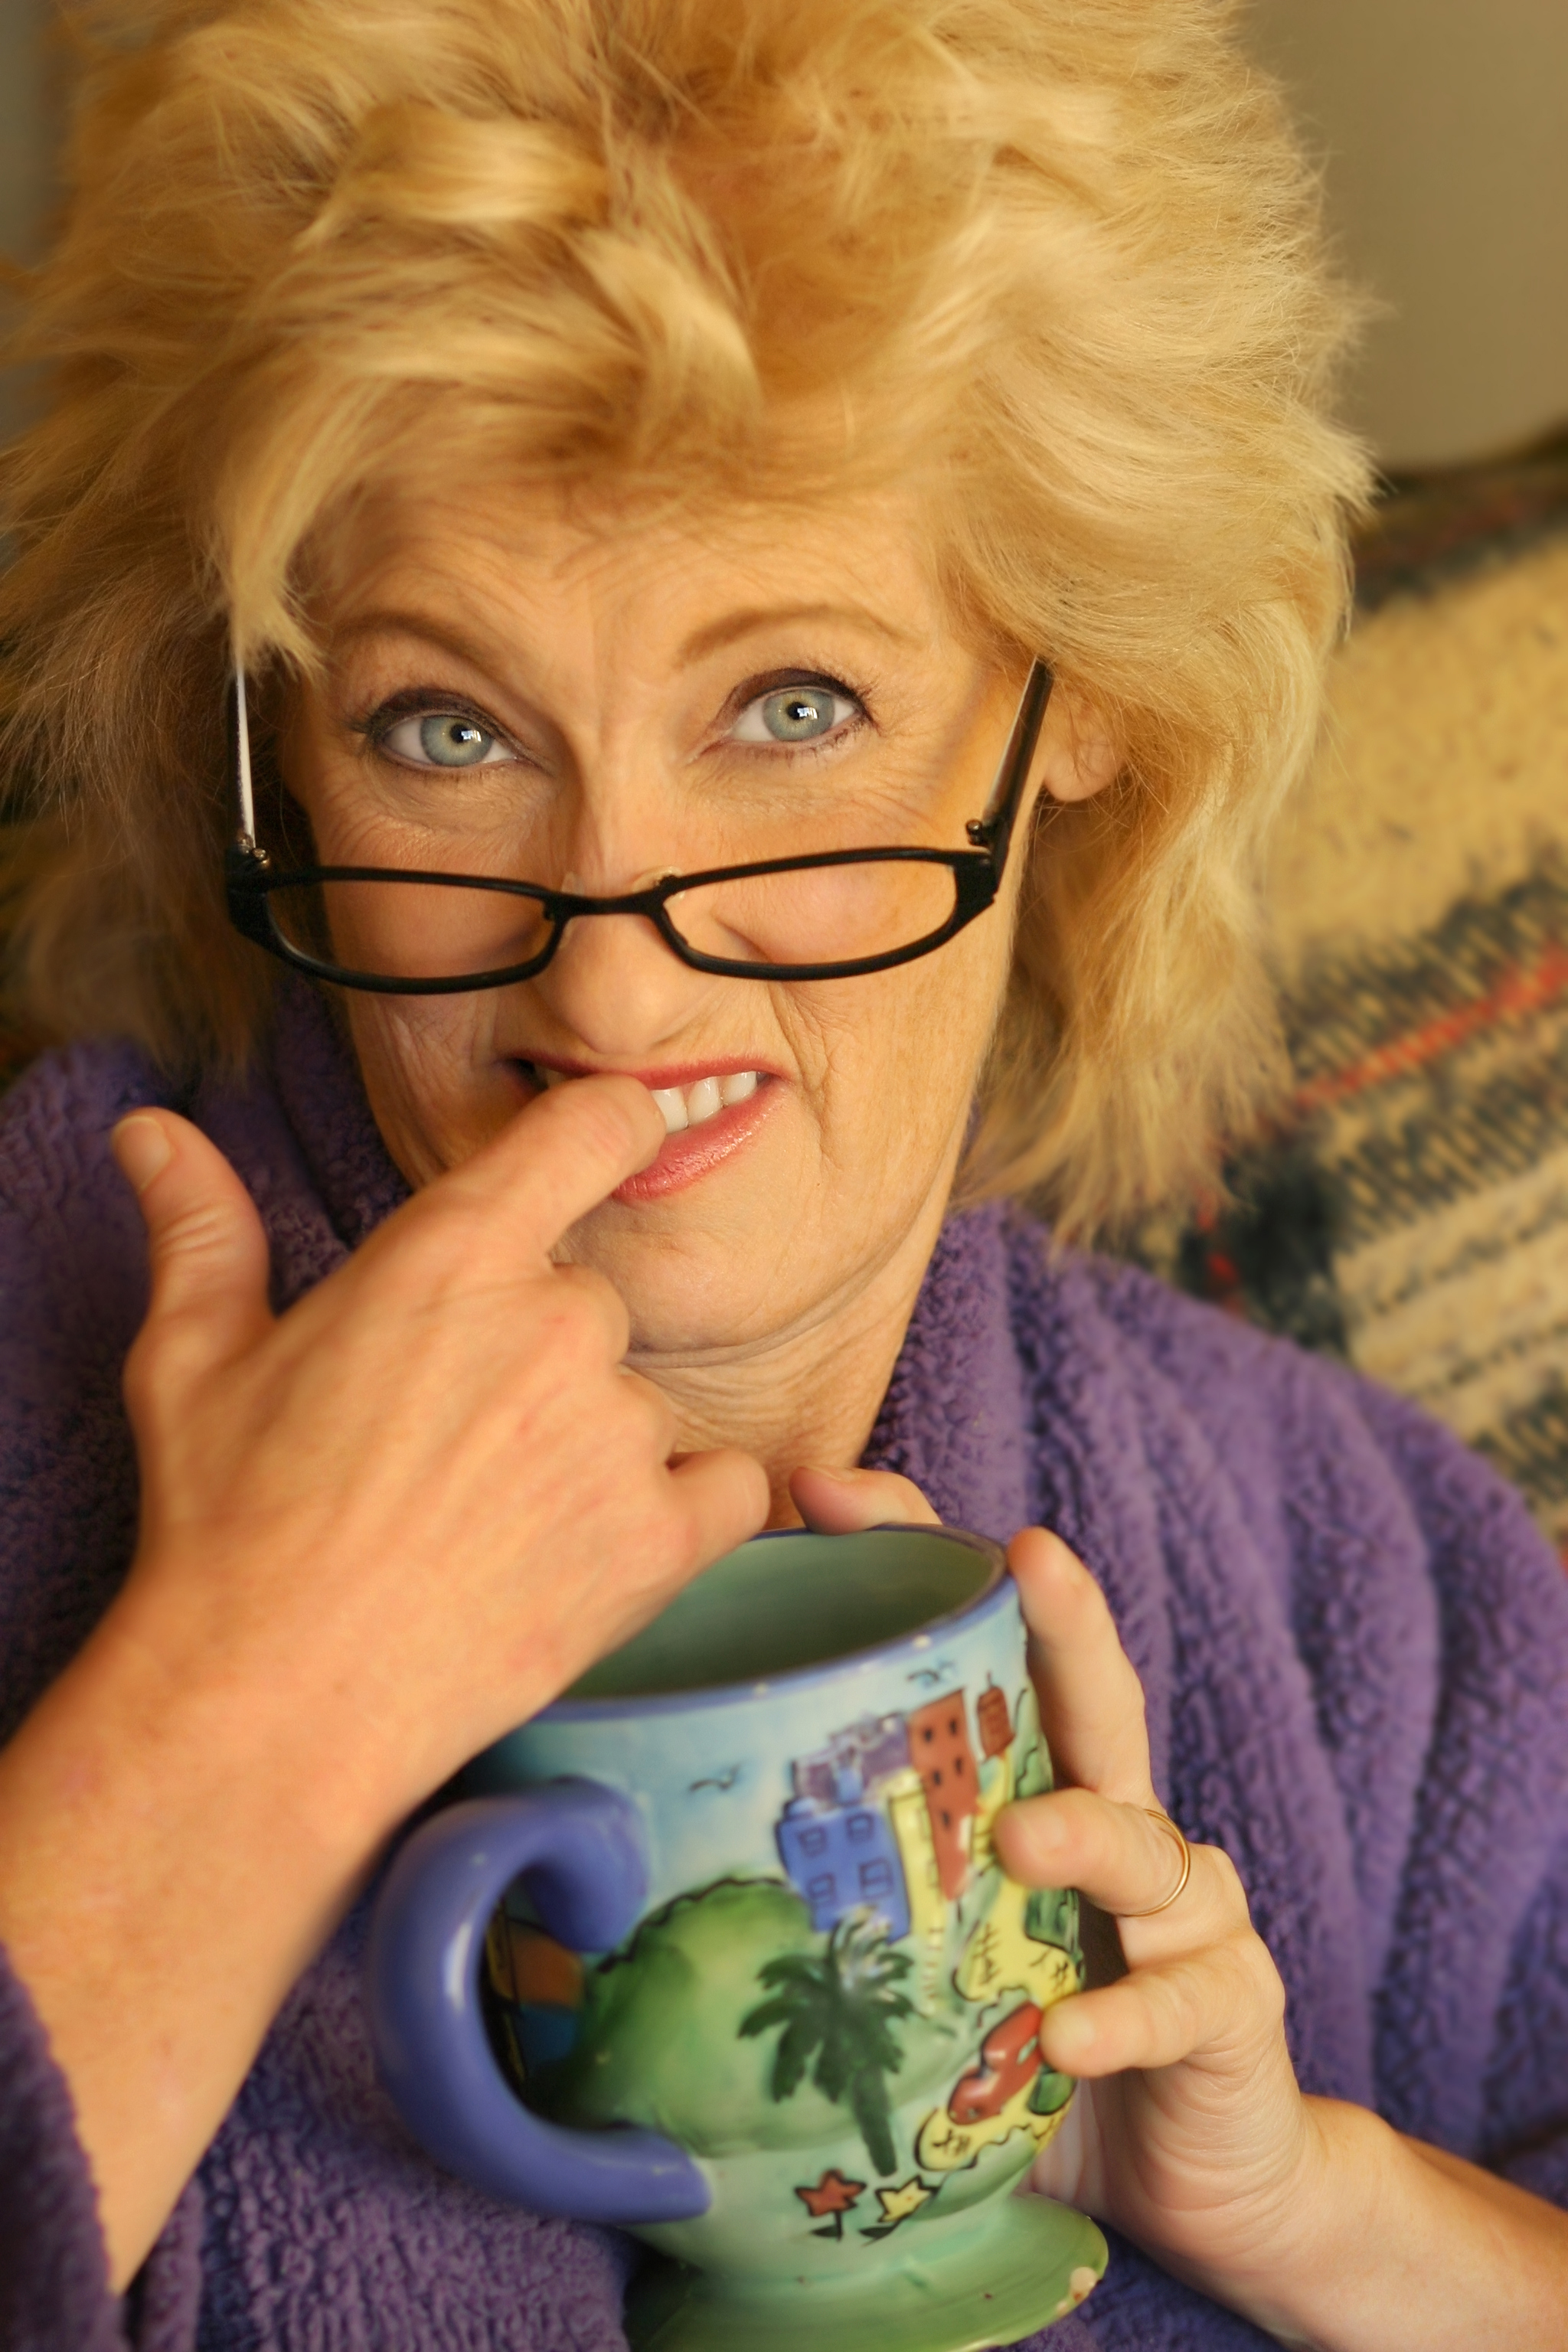 Woman biting figner